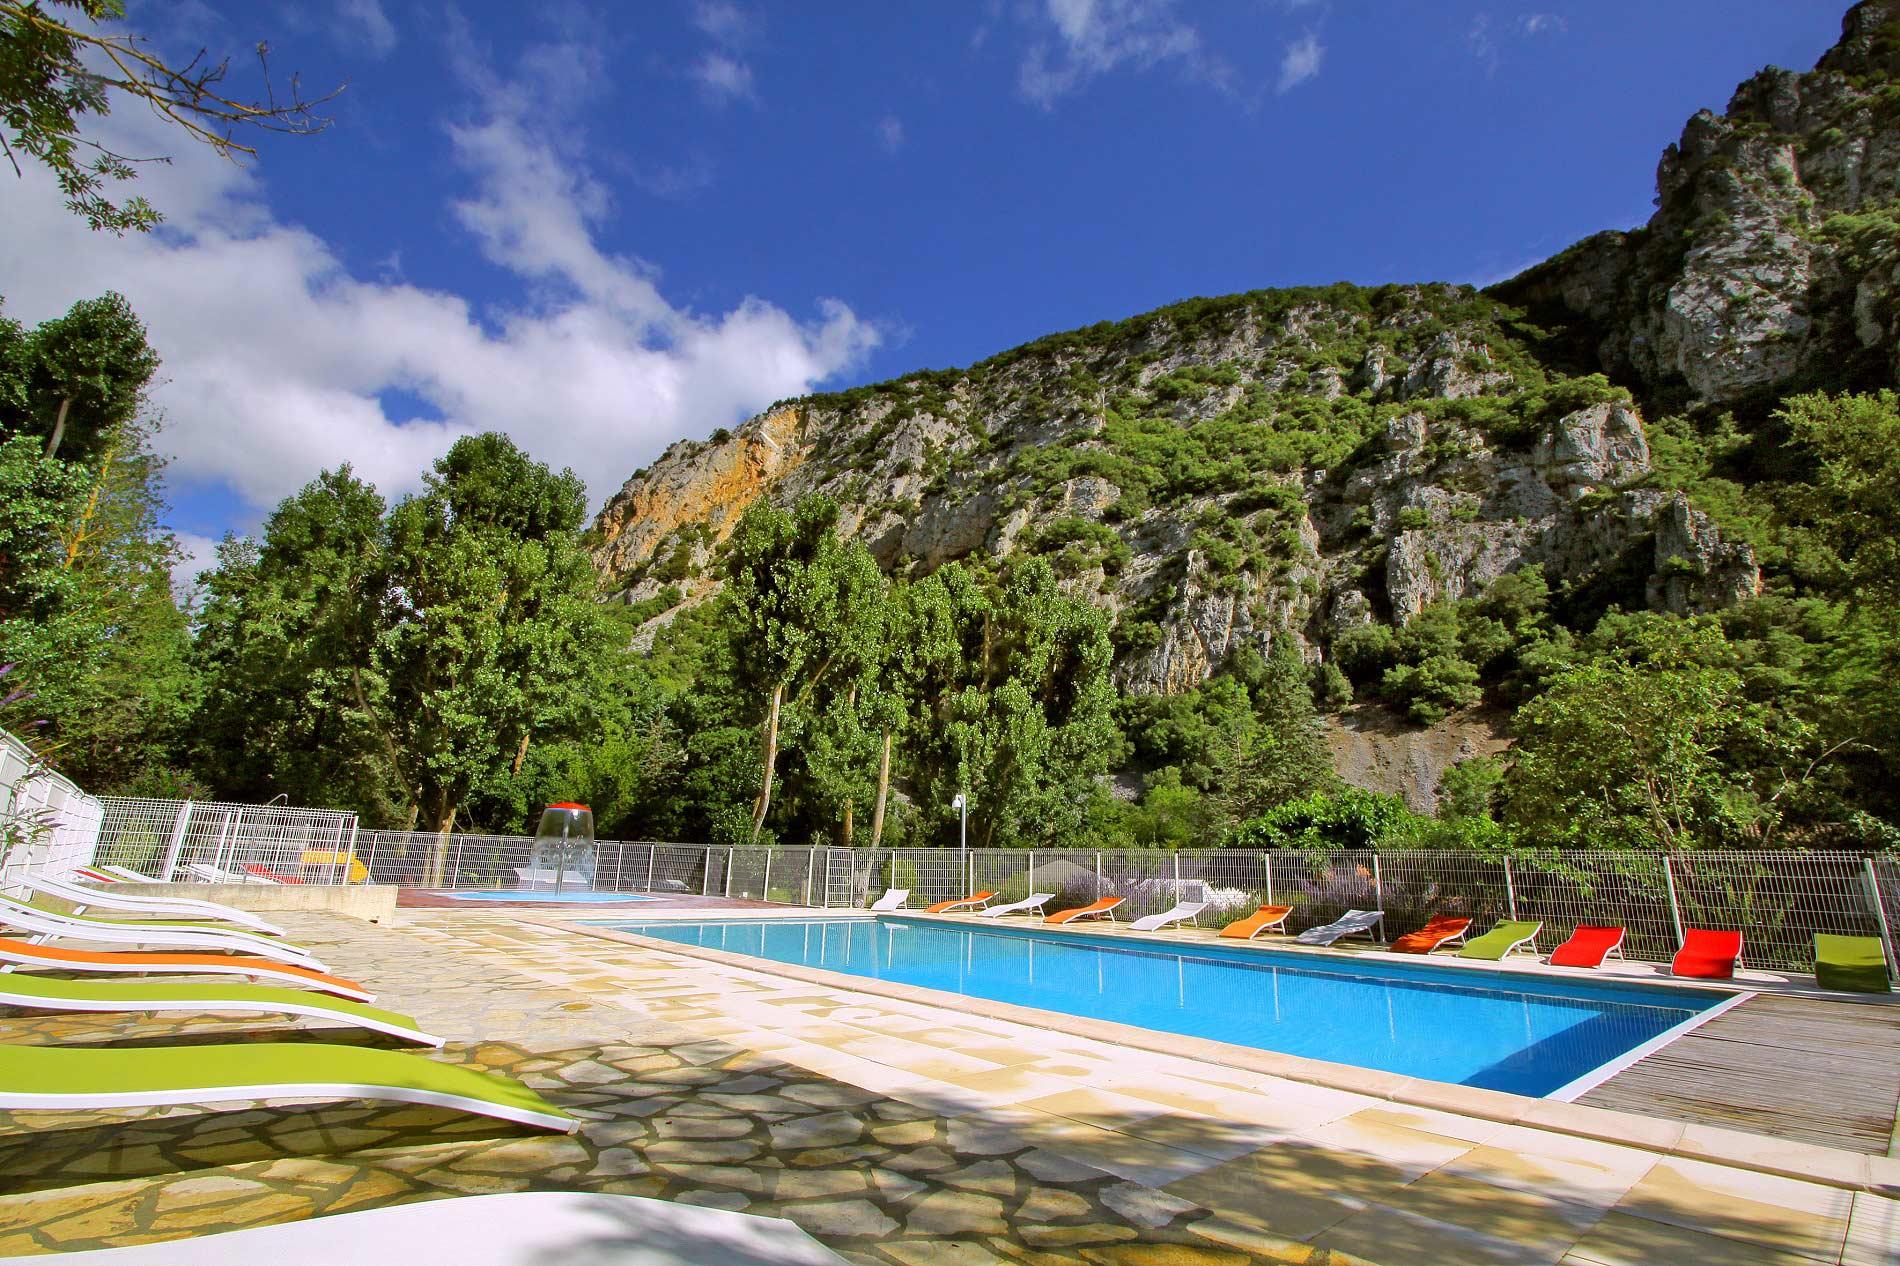 camping avec piscine chauffée